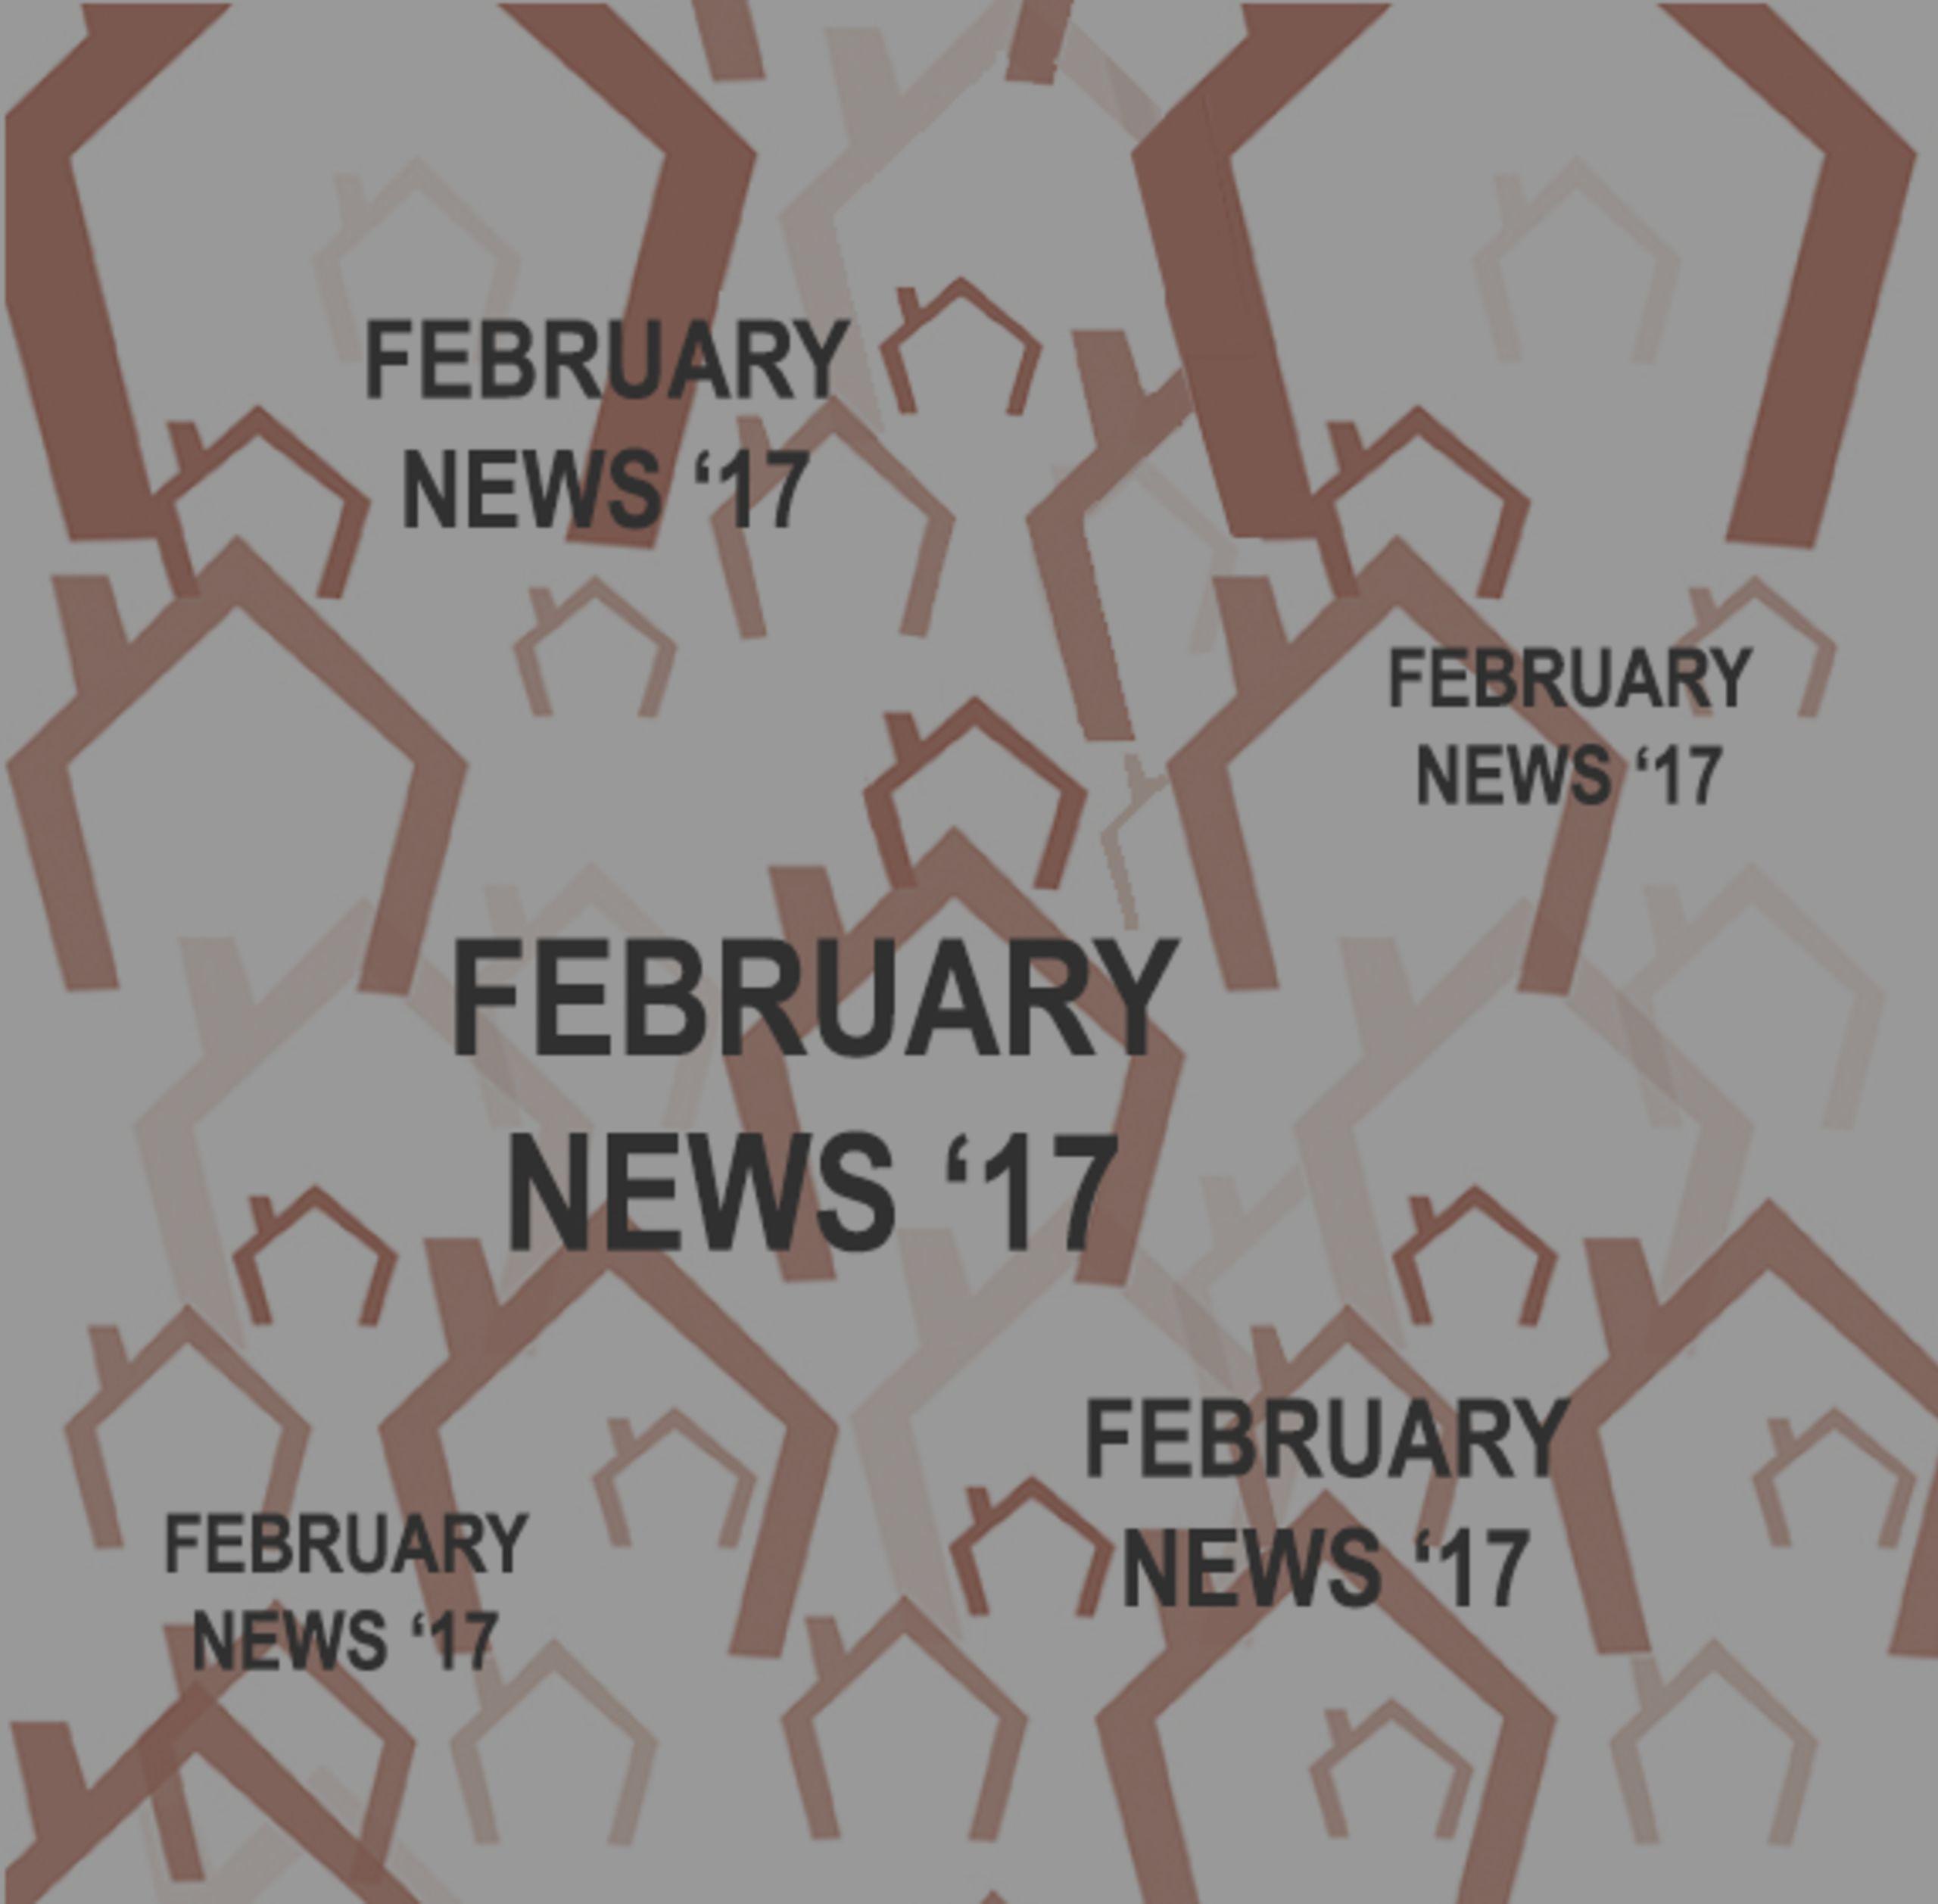 Cindy's Newsletter for February 2017